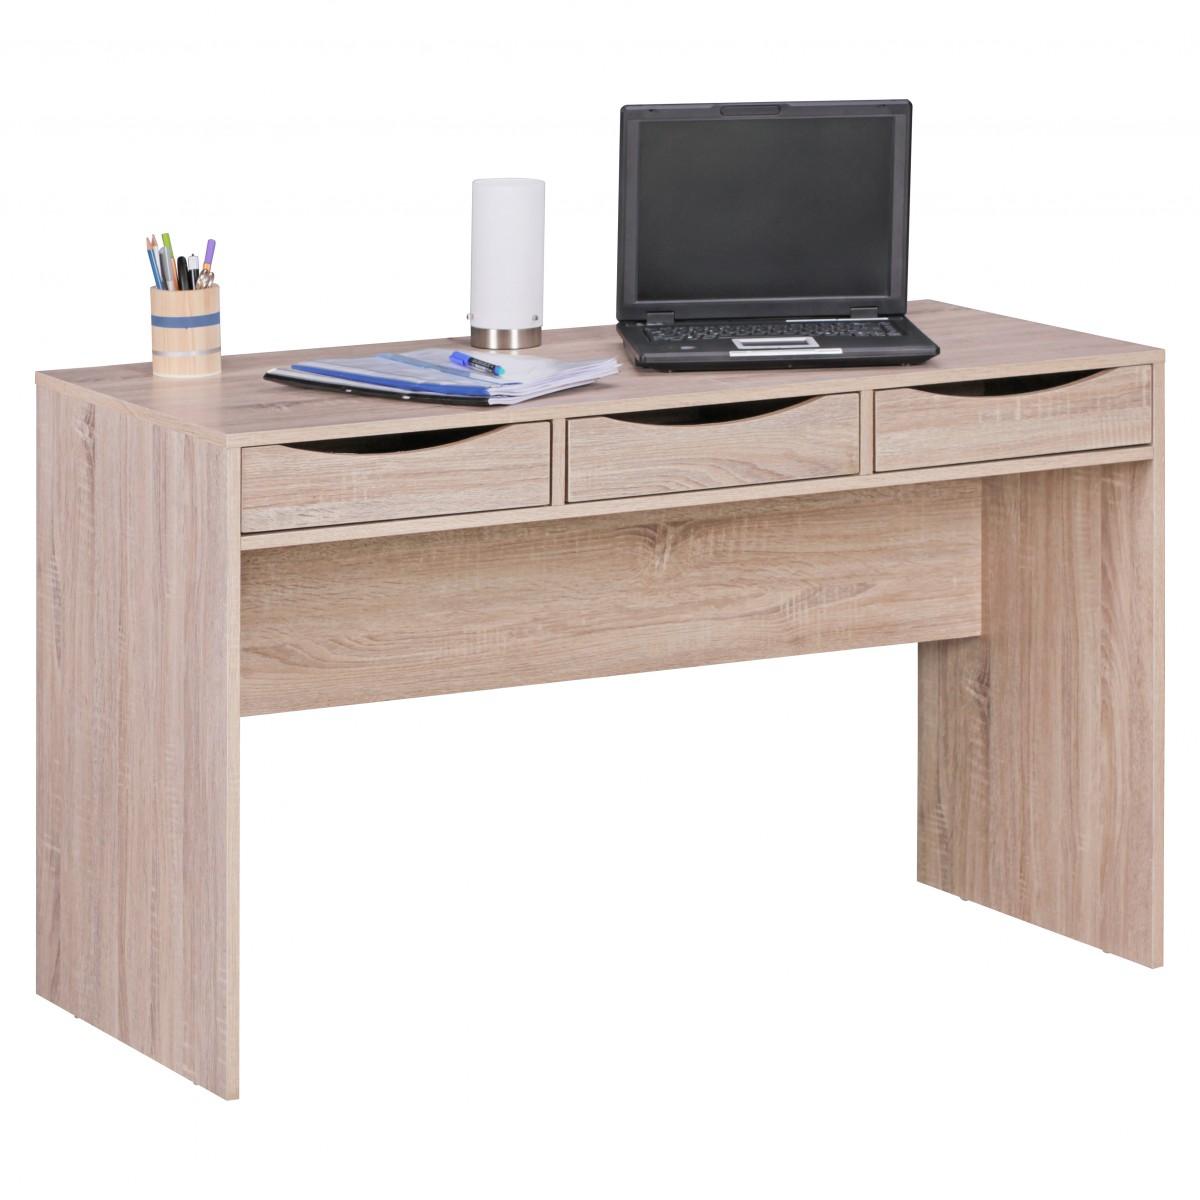 Psací stůl se zásuvkami Samo, 120 cm, Sonoma dub